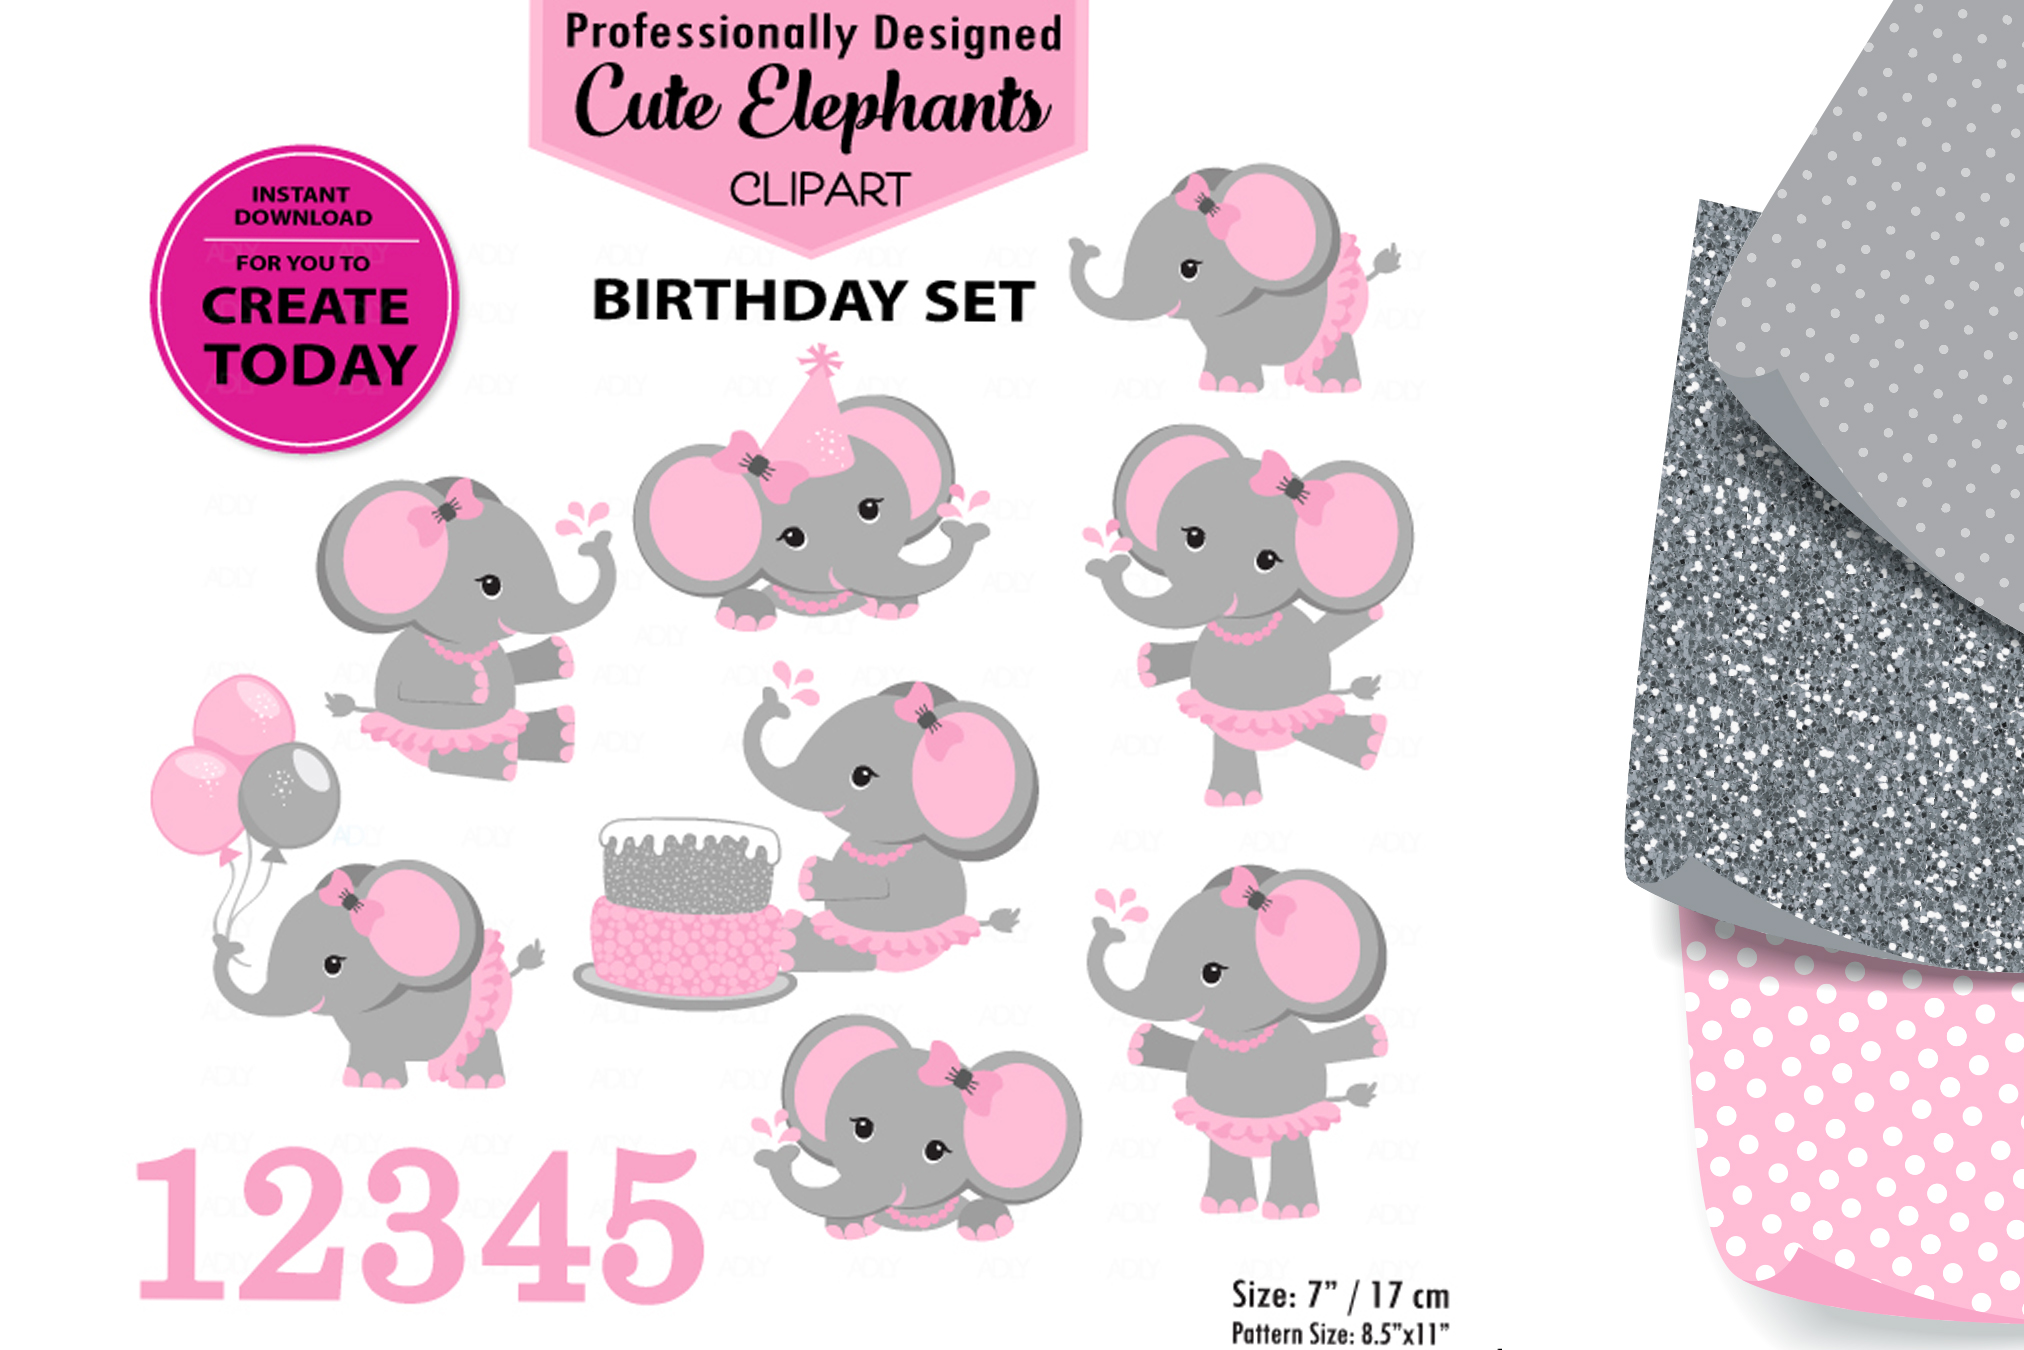 Pink Cute Baby Flower Birthday Cake Elephant. example image 1